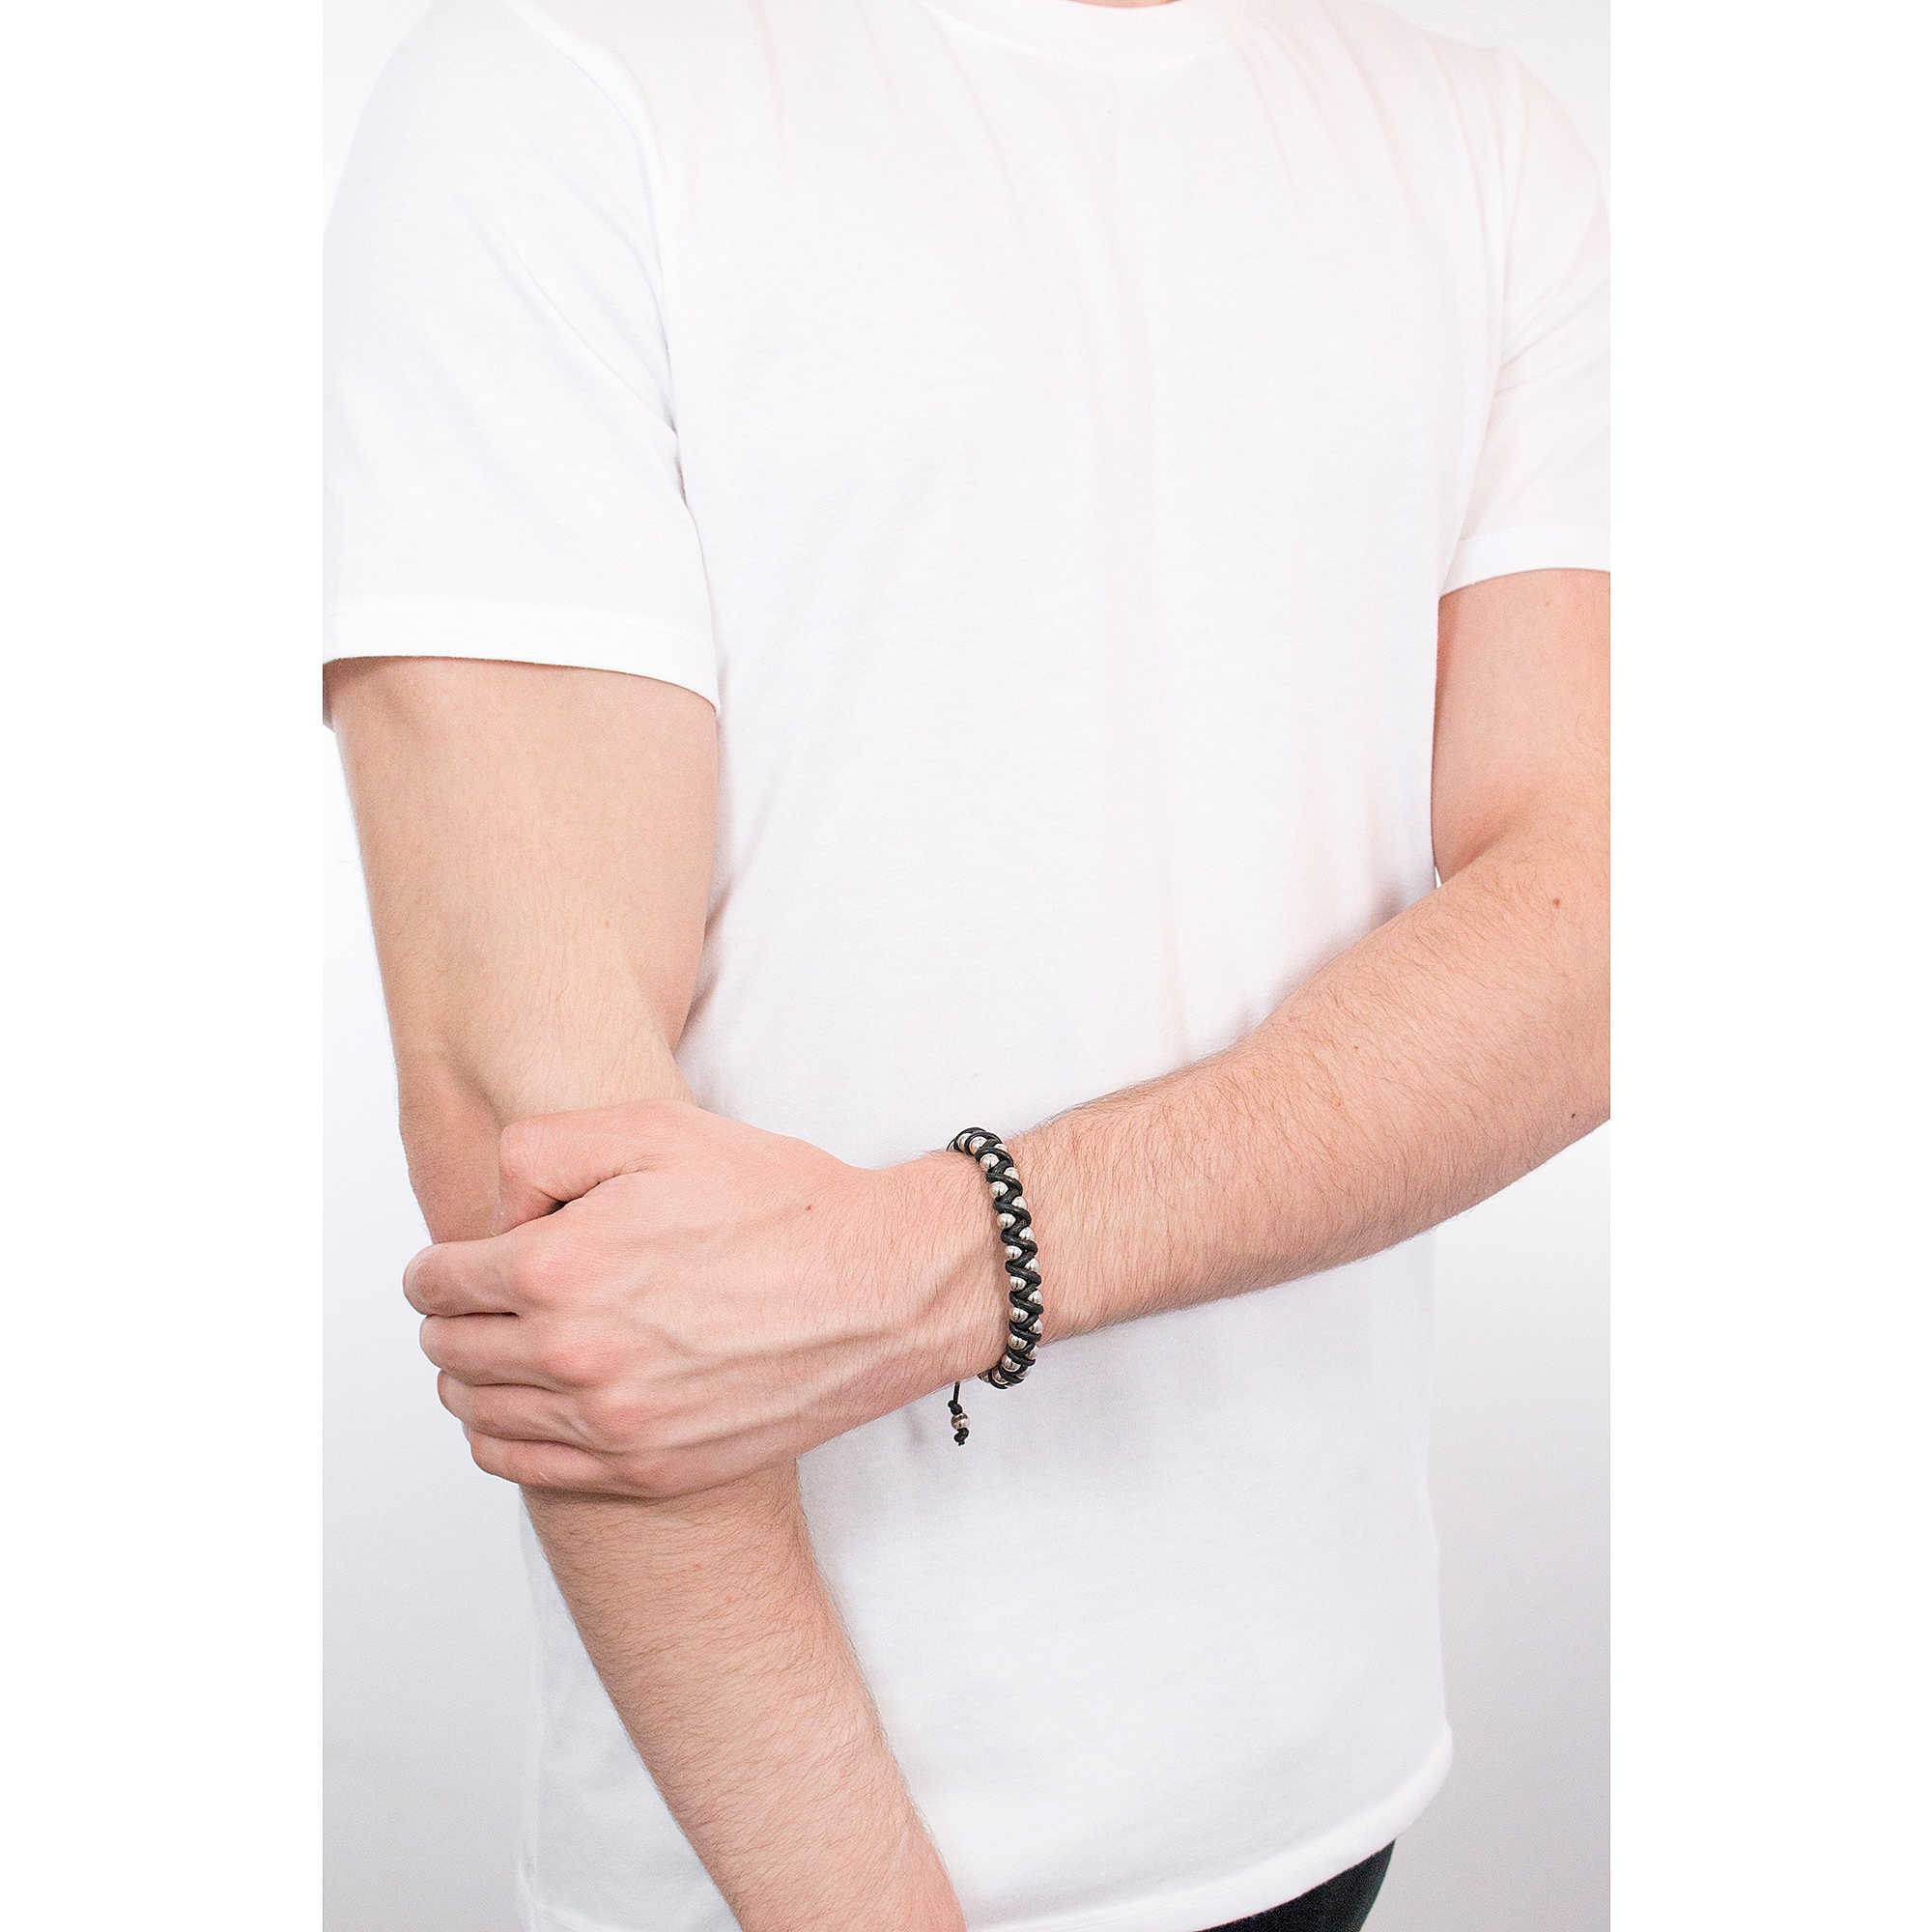 bracelet man jewellery Diesel Stackables DX1109040. zoom. Diesel bracelets  Stackables man DX1109040 photo wearing. zoom 7a0a36fa2bda